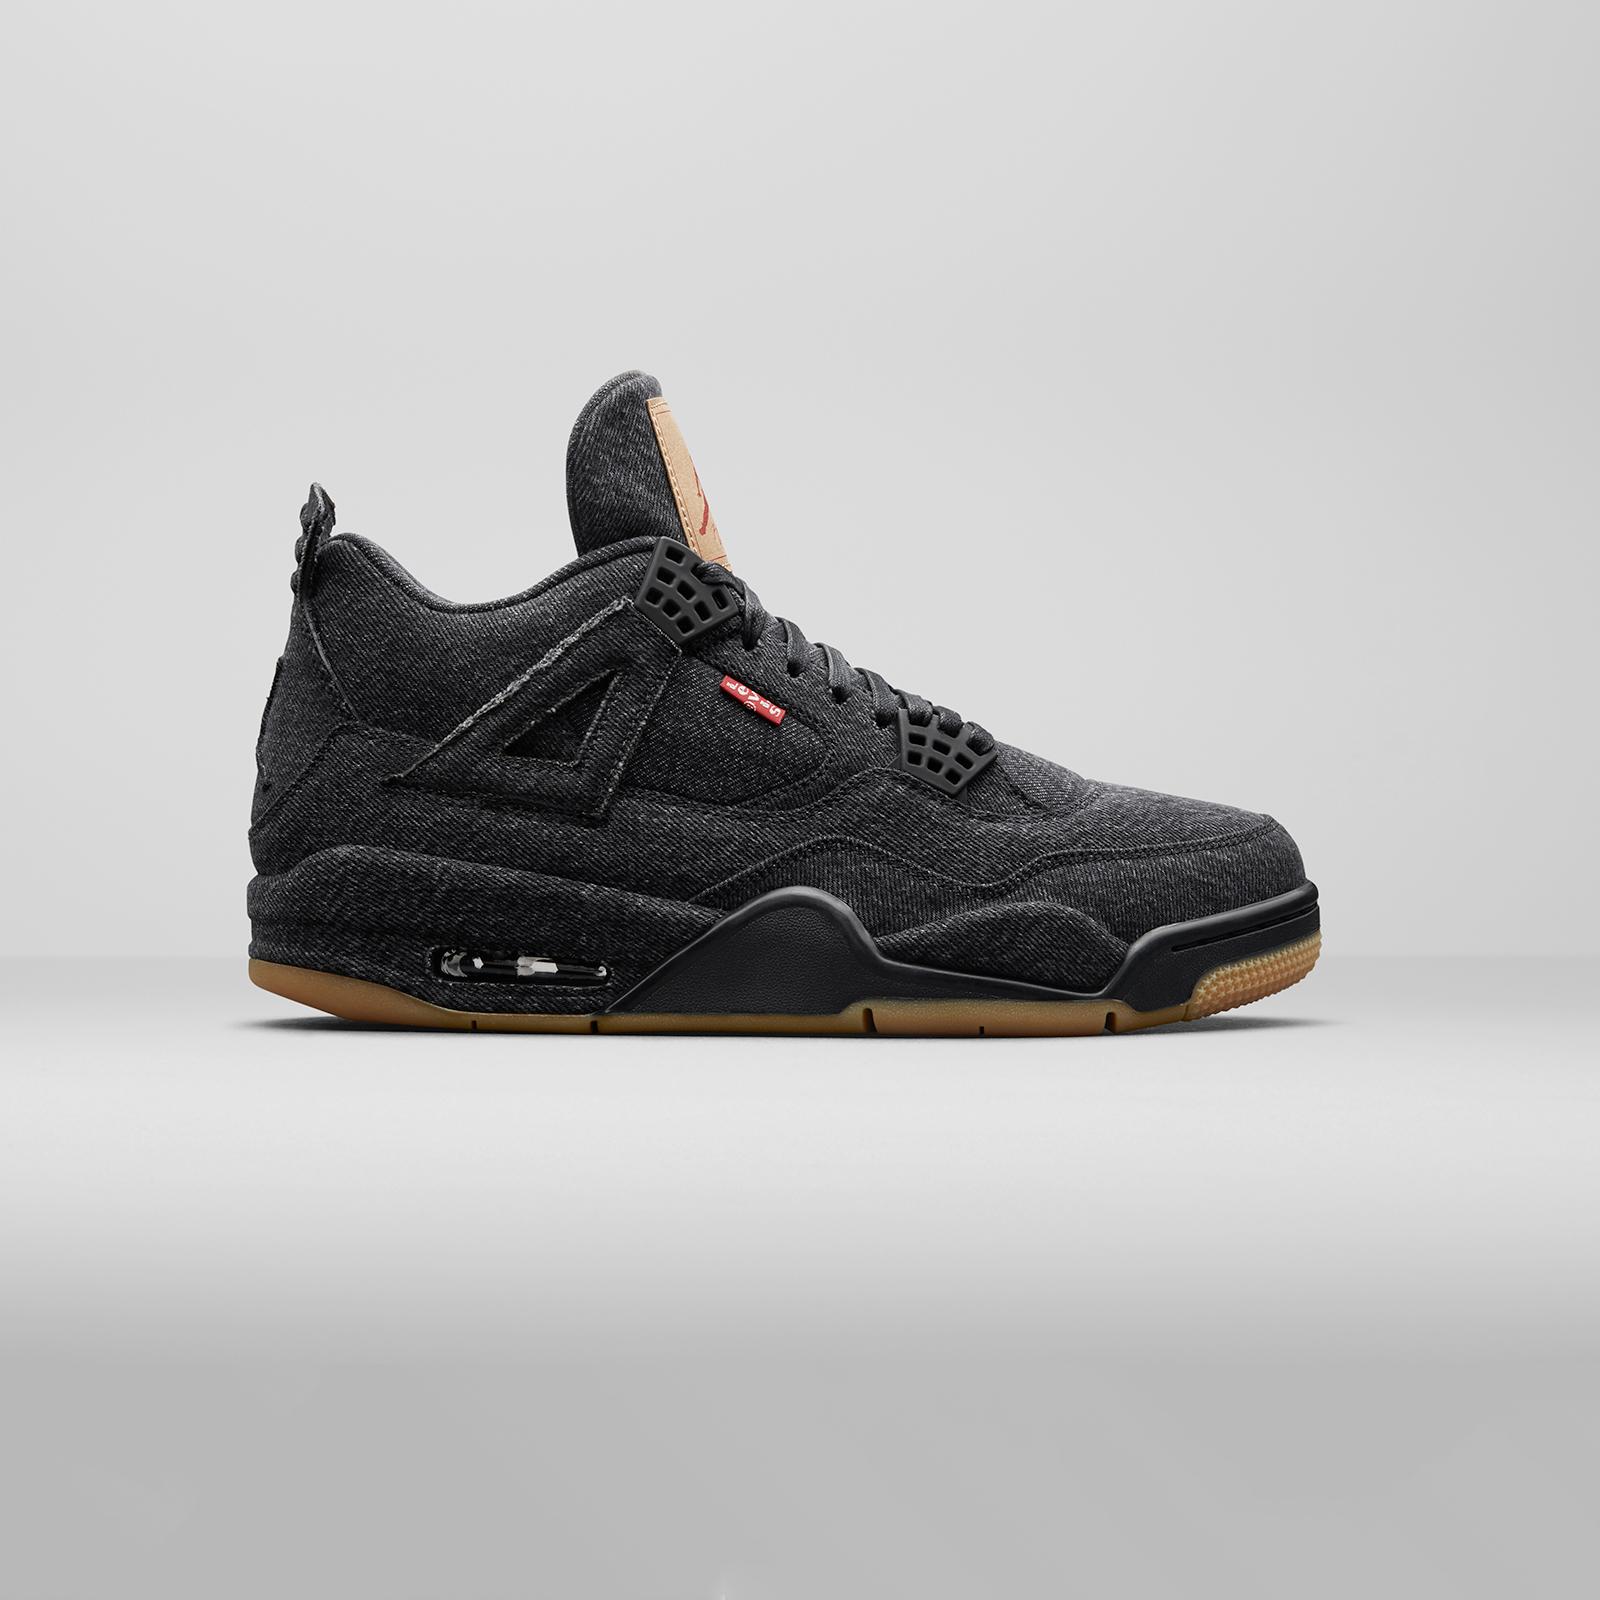 a318418f337 Jordan Brand Air Jordan 4 Retro Levis NRG - Ao2571-001 ...